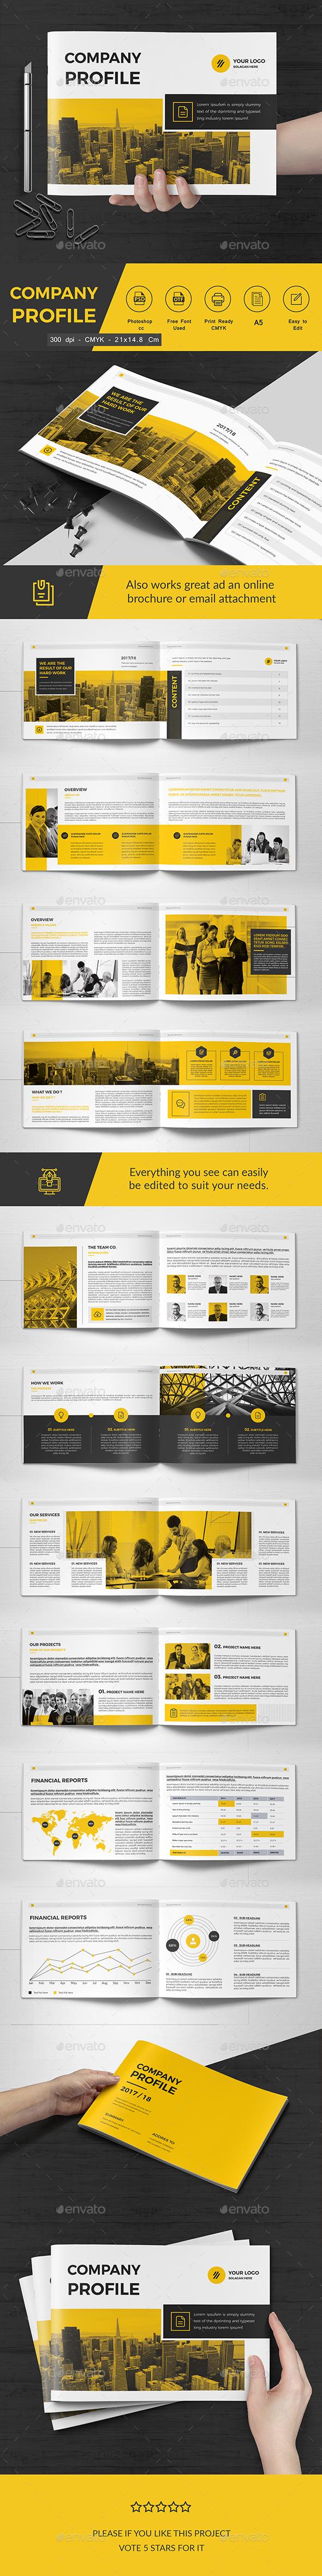 Co Landscape Brochure 22 Pages - Corporate Brochures